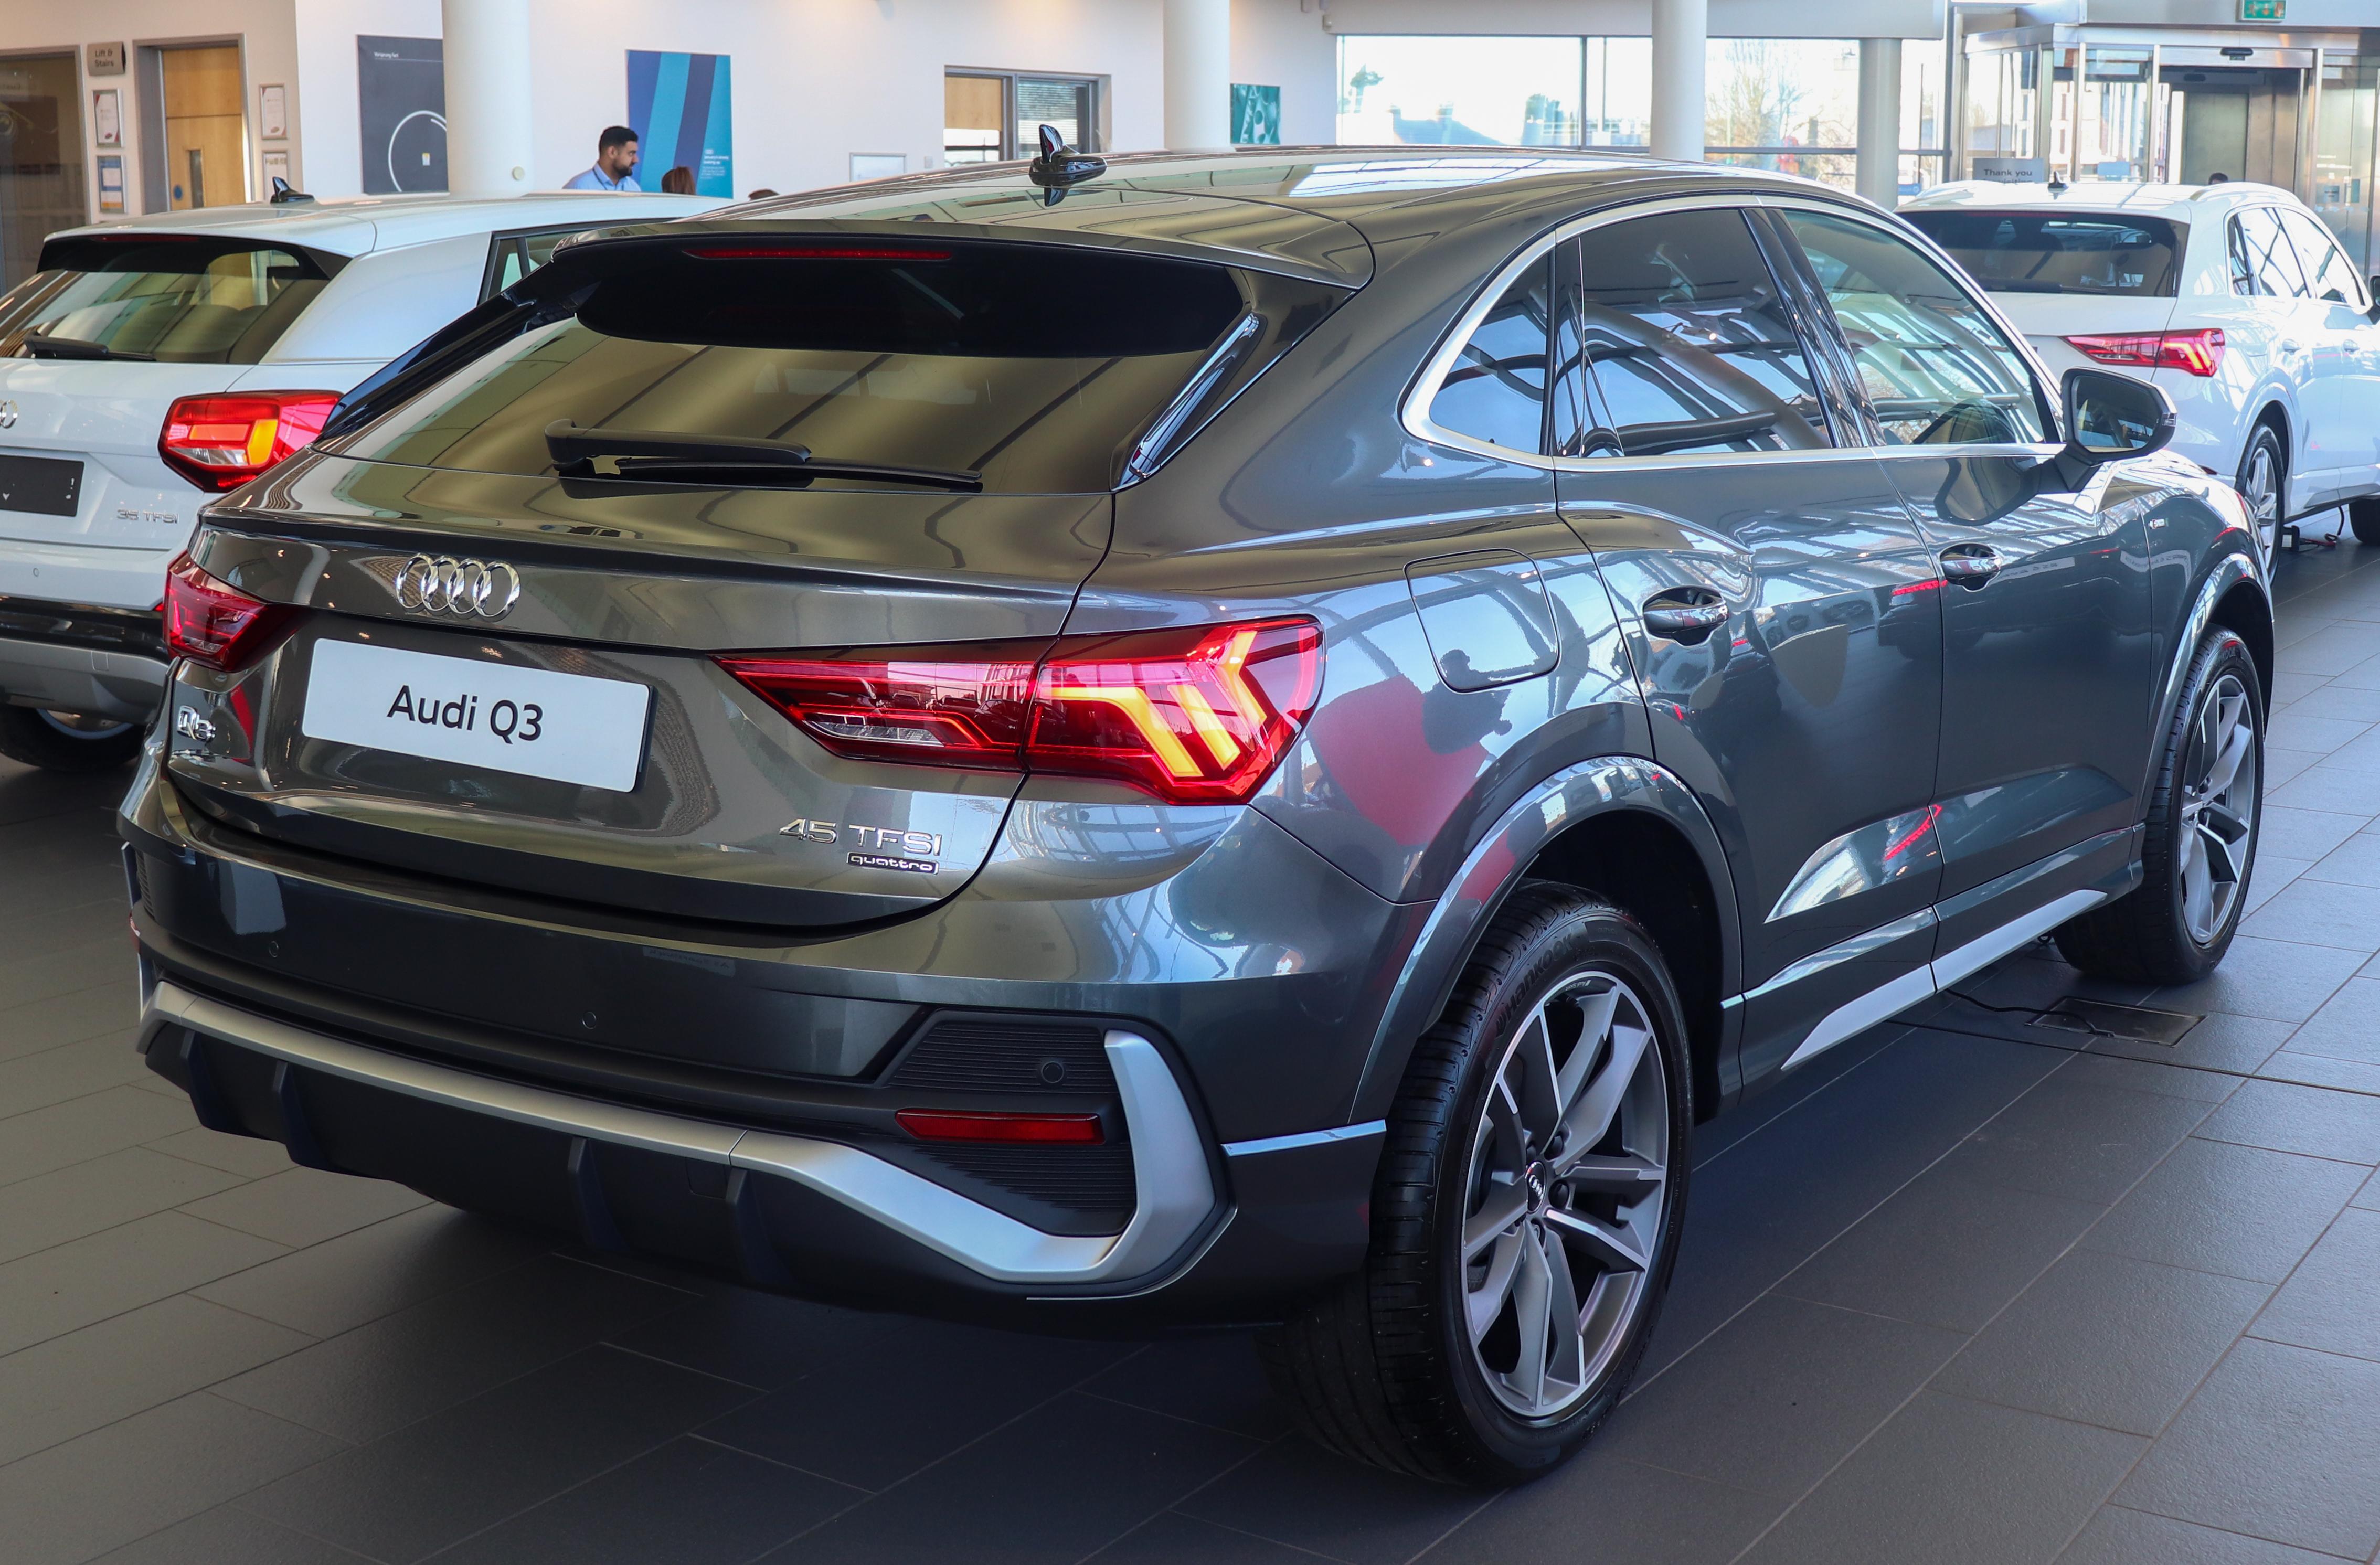 Kekurangan Audi Sportback Spesifikasi